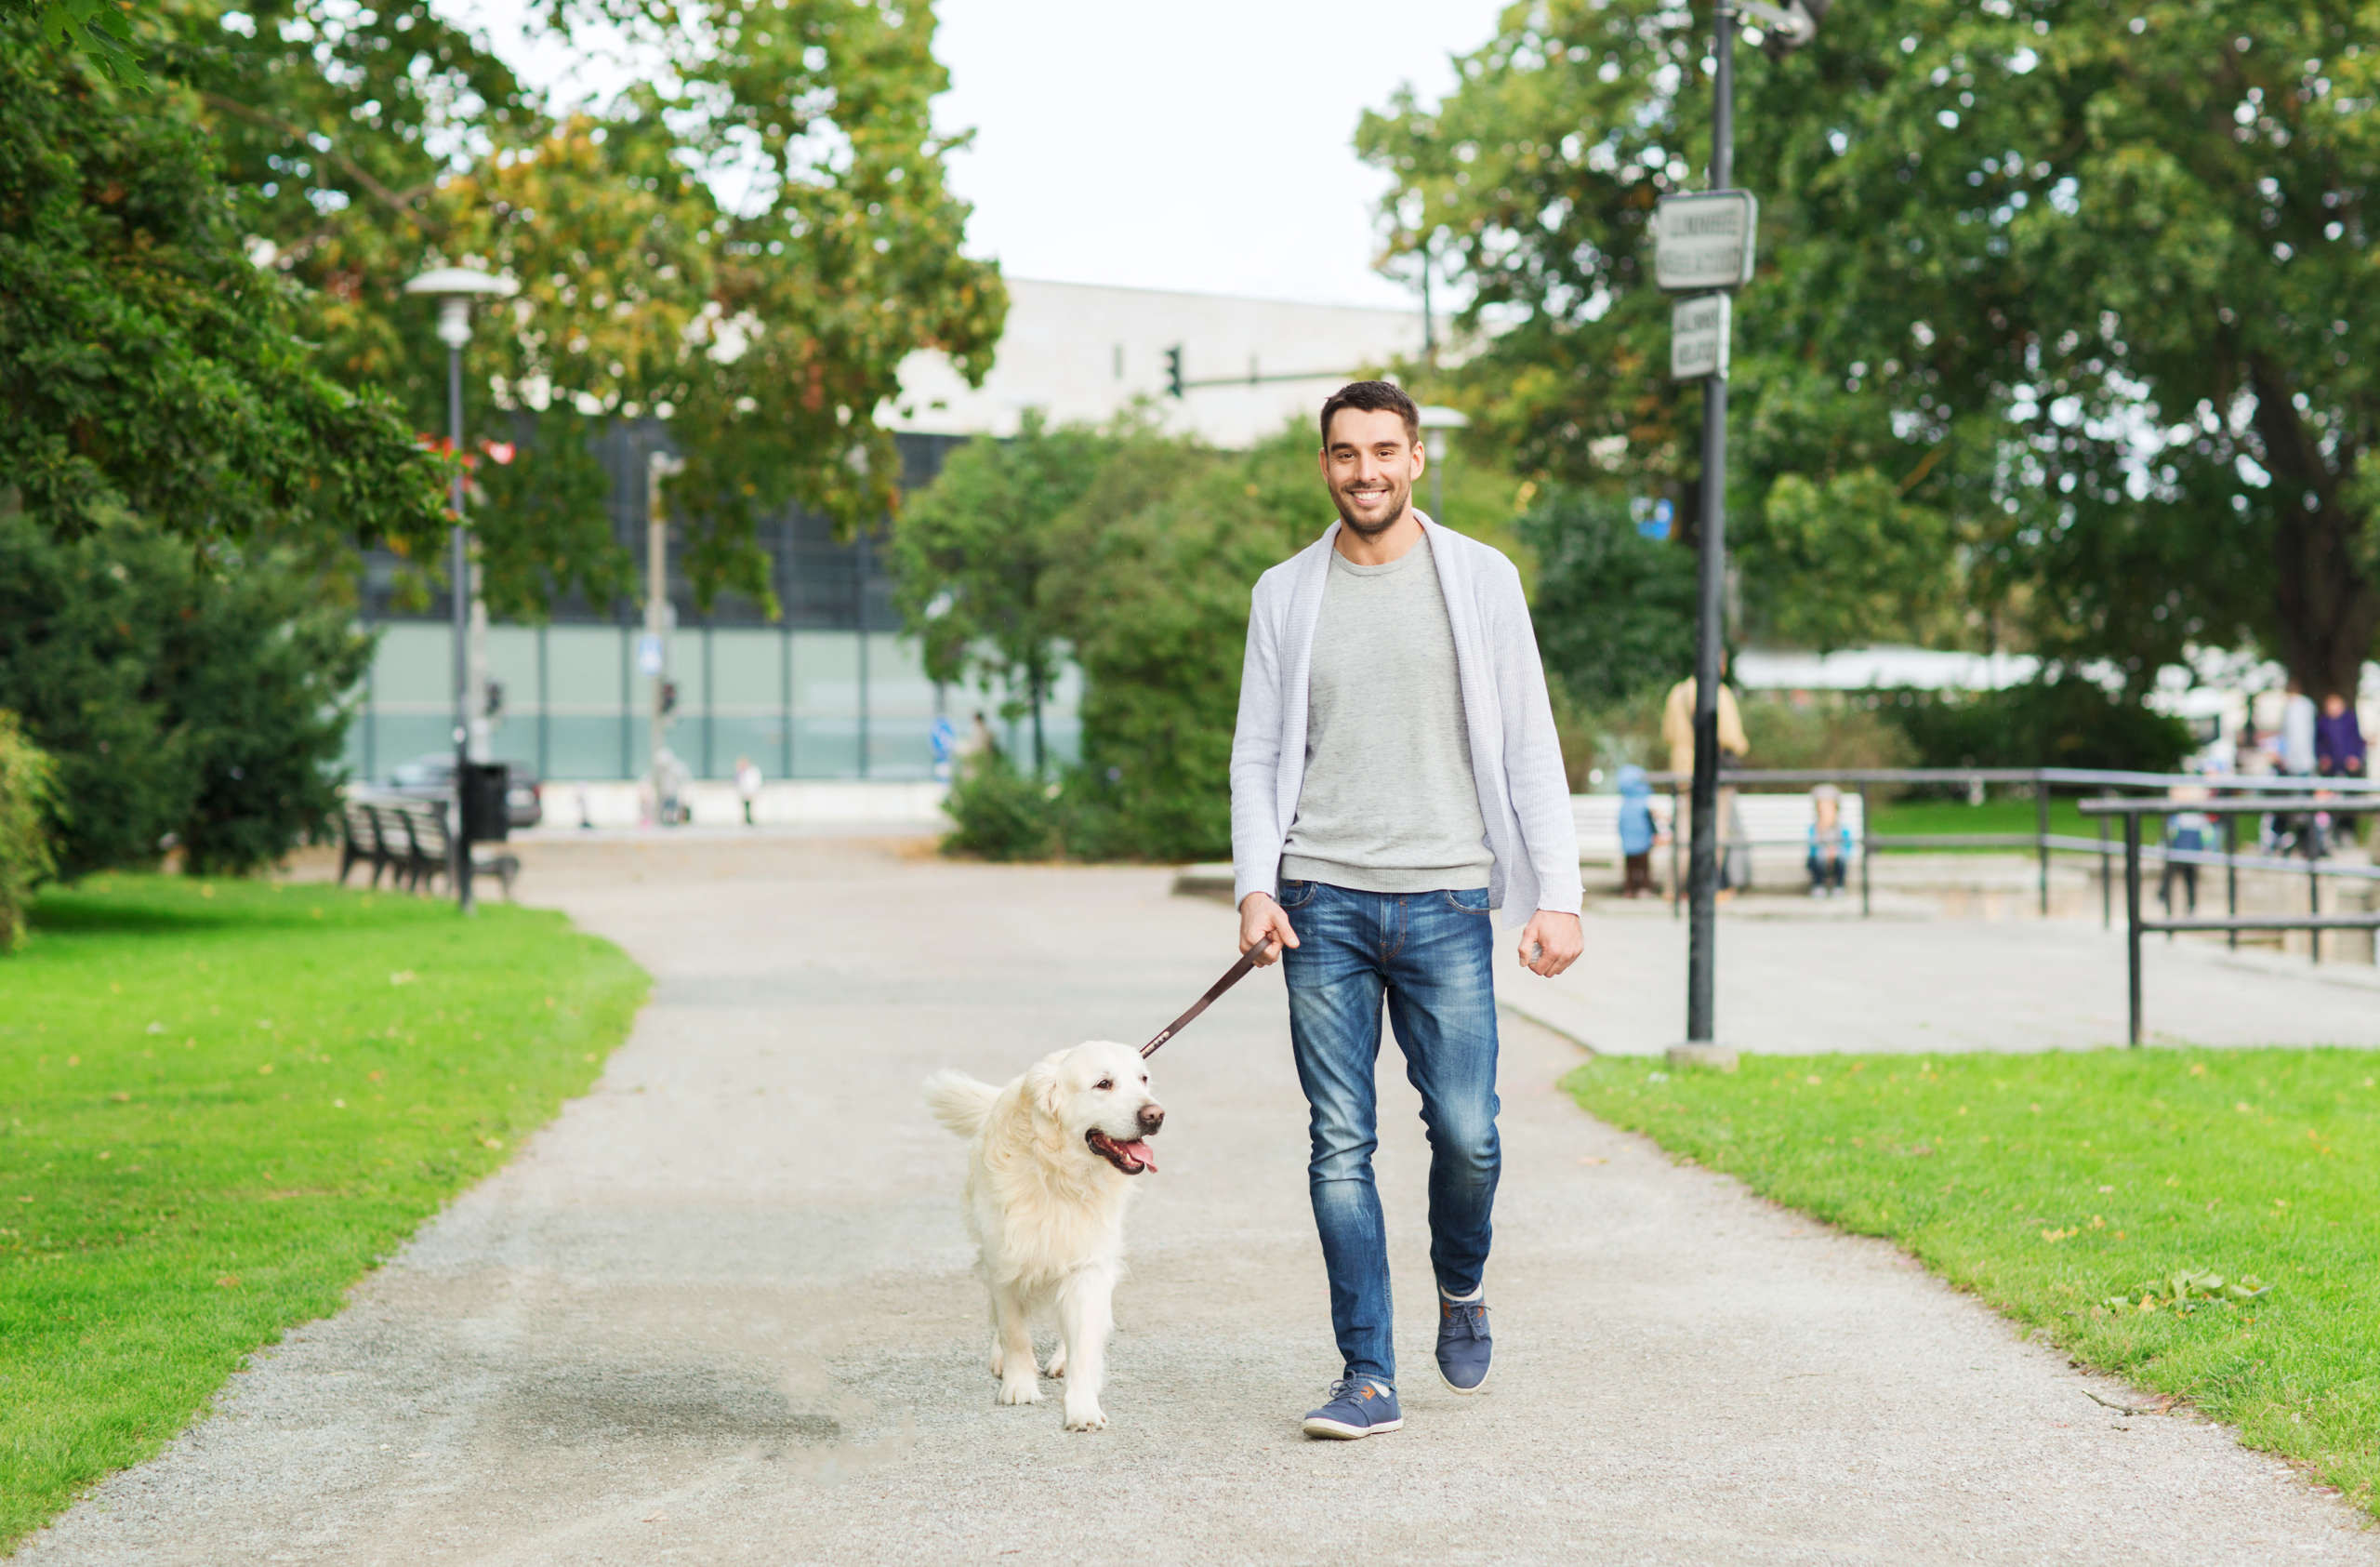 guy walking a dog